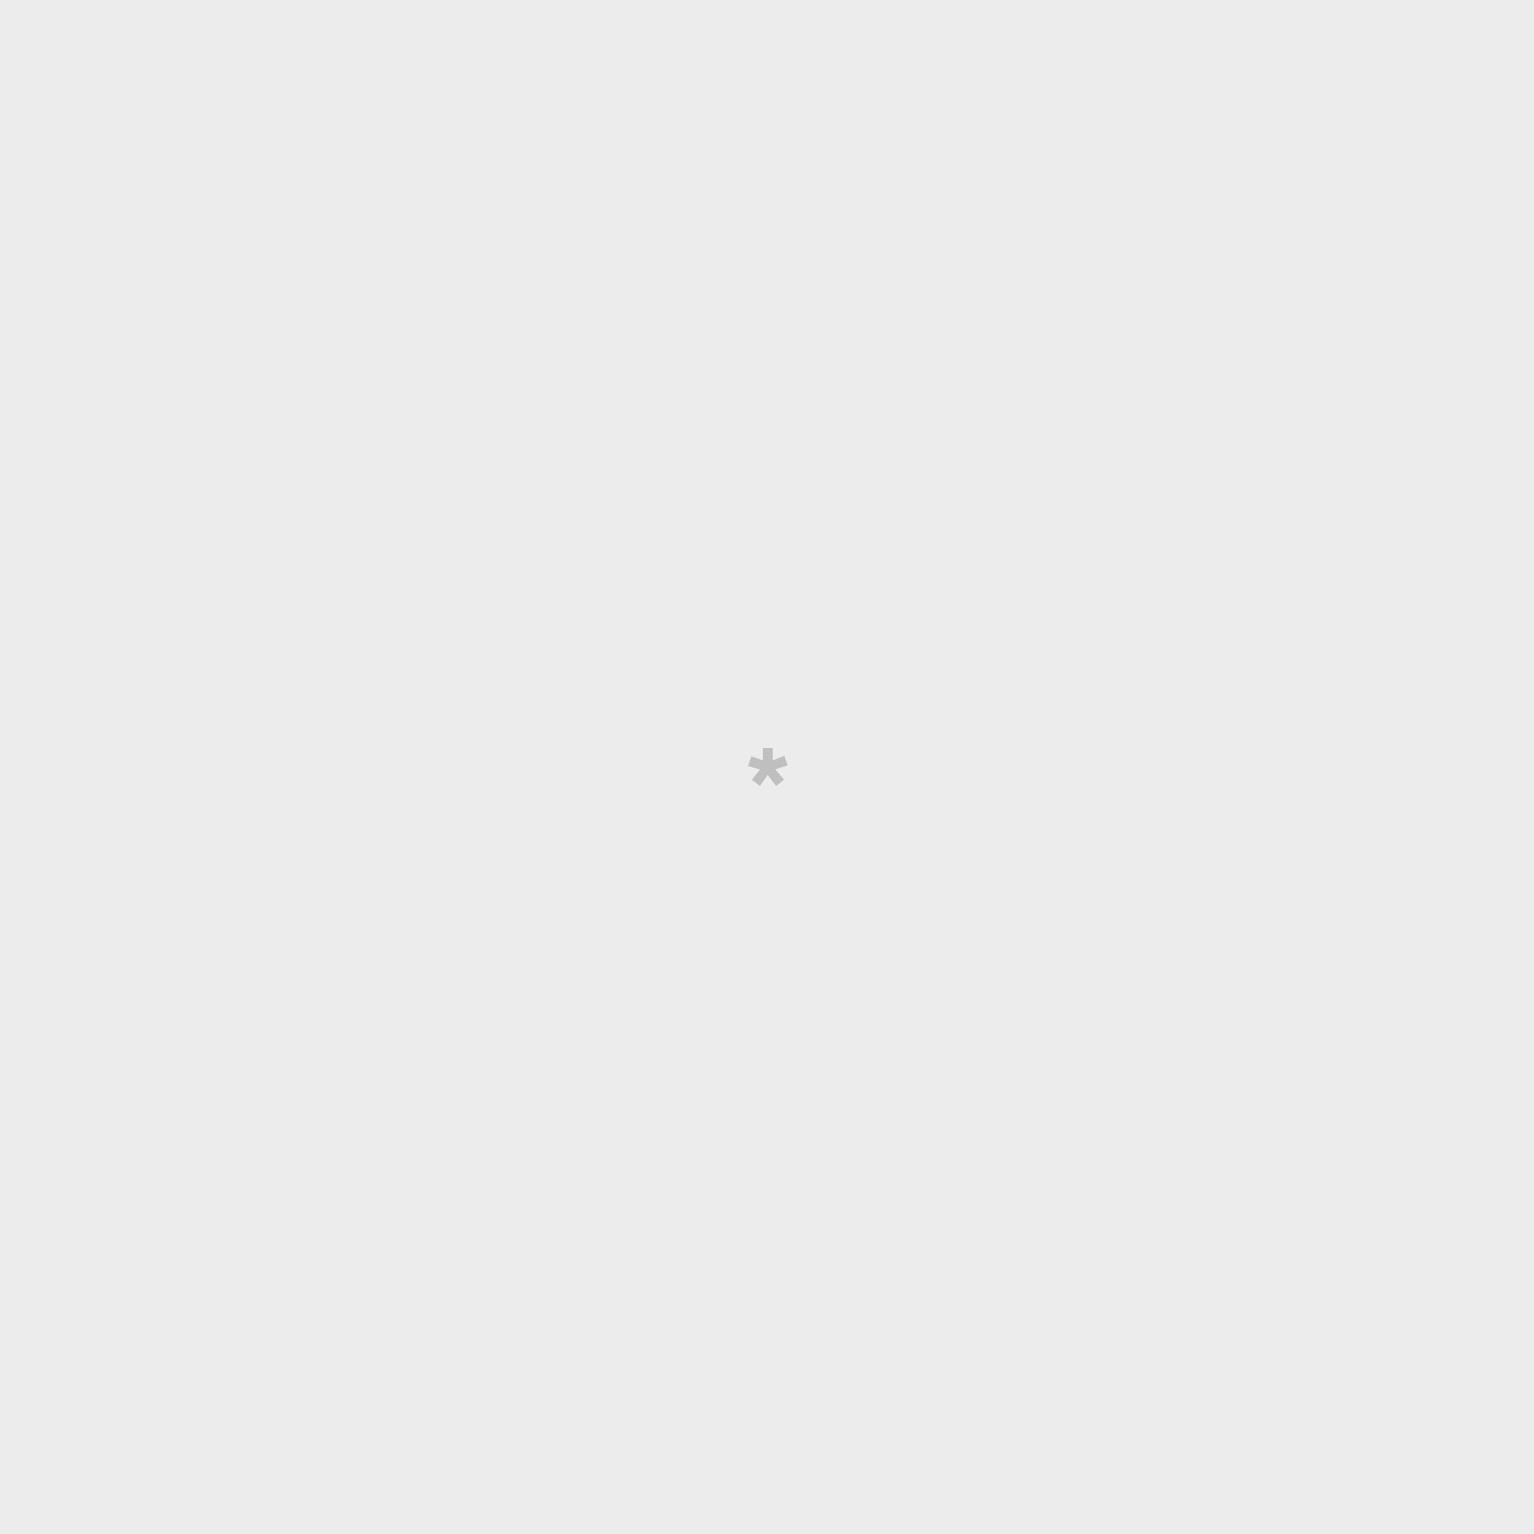 Custodia per iPad da 10,2